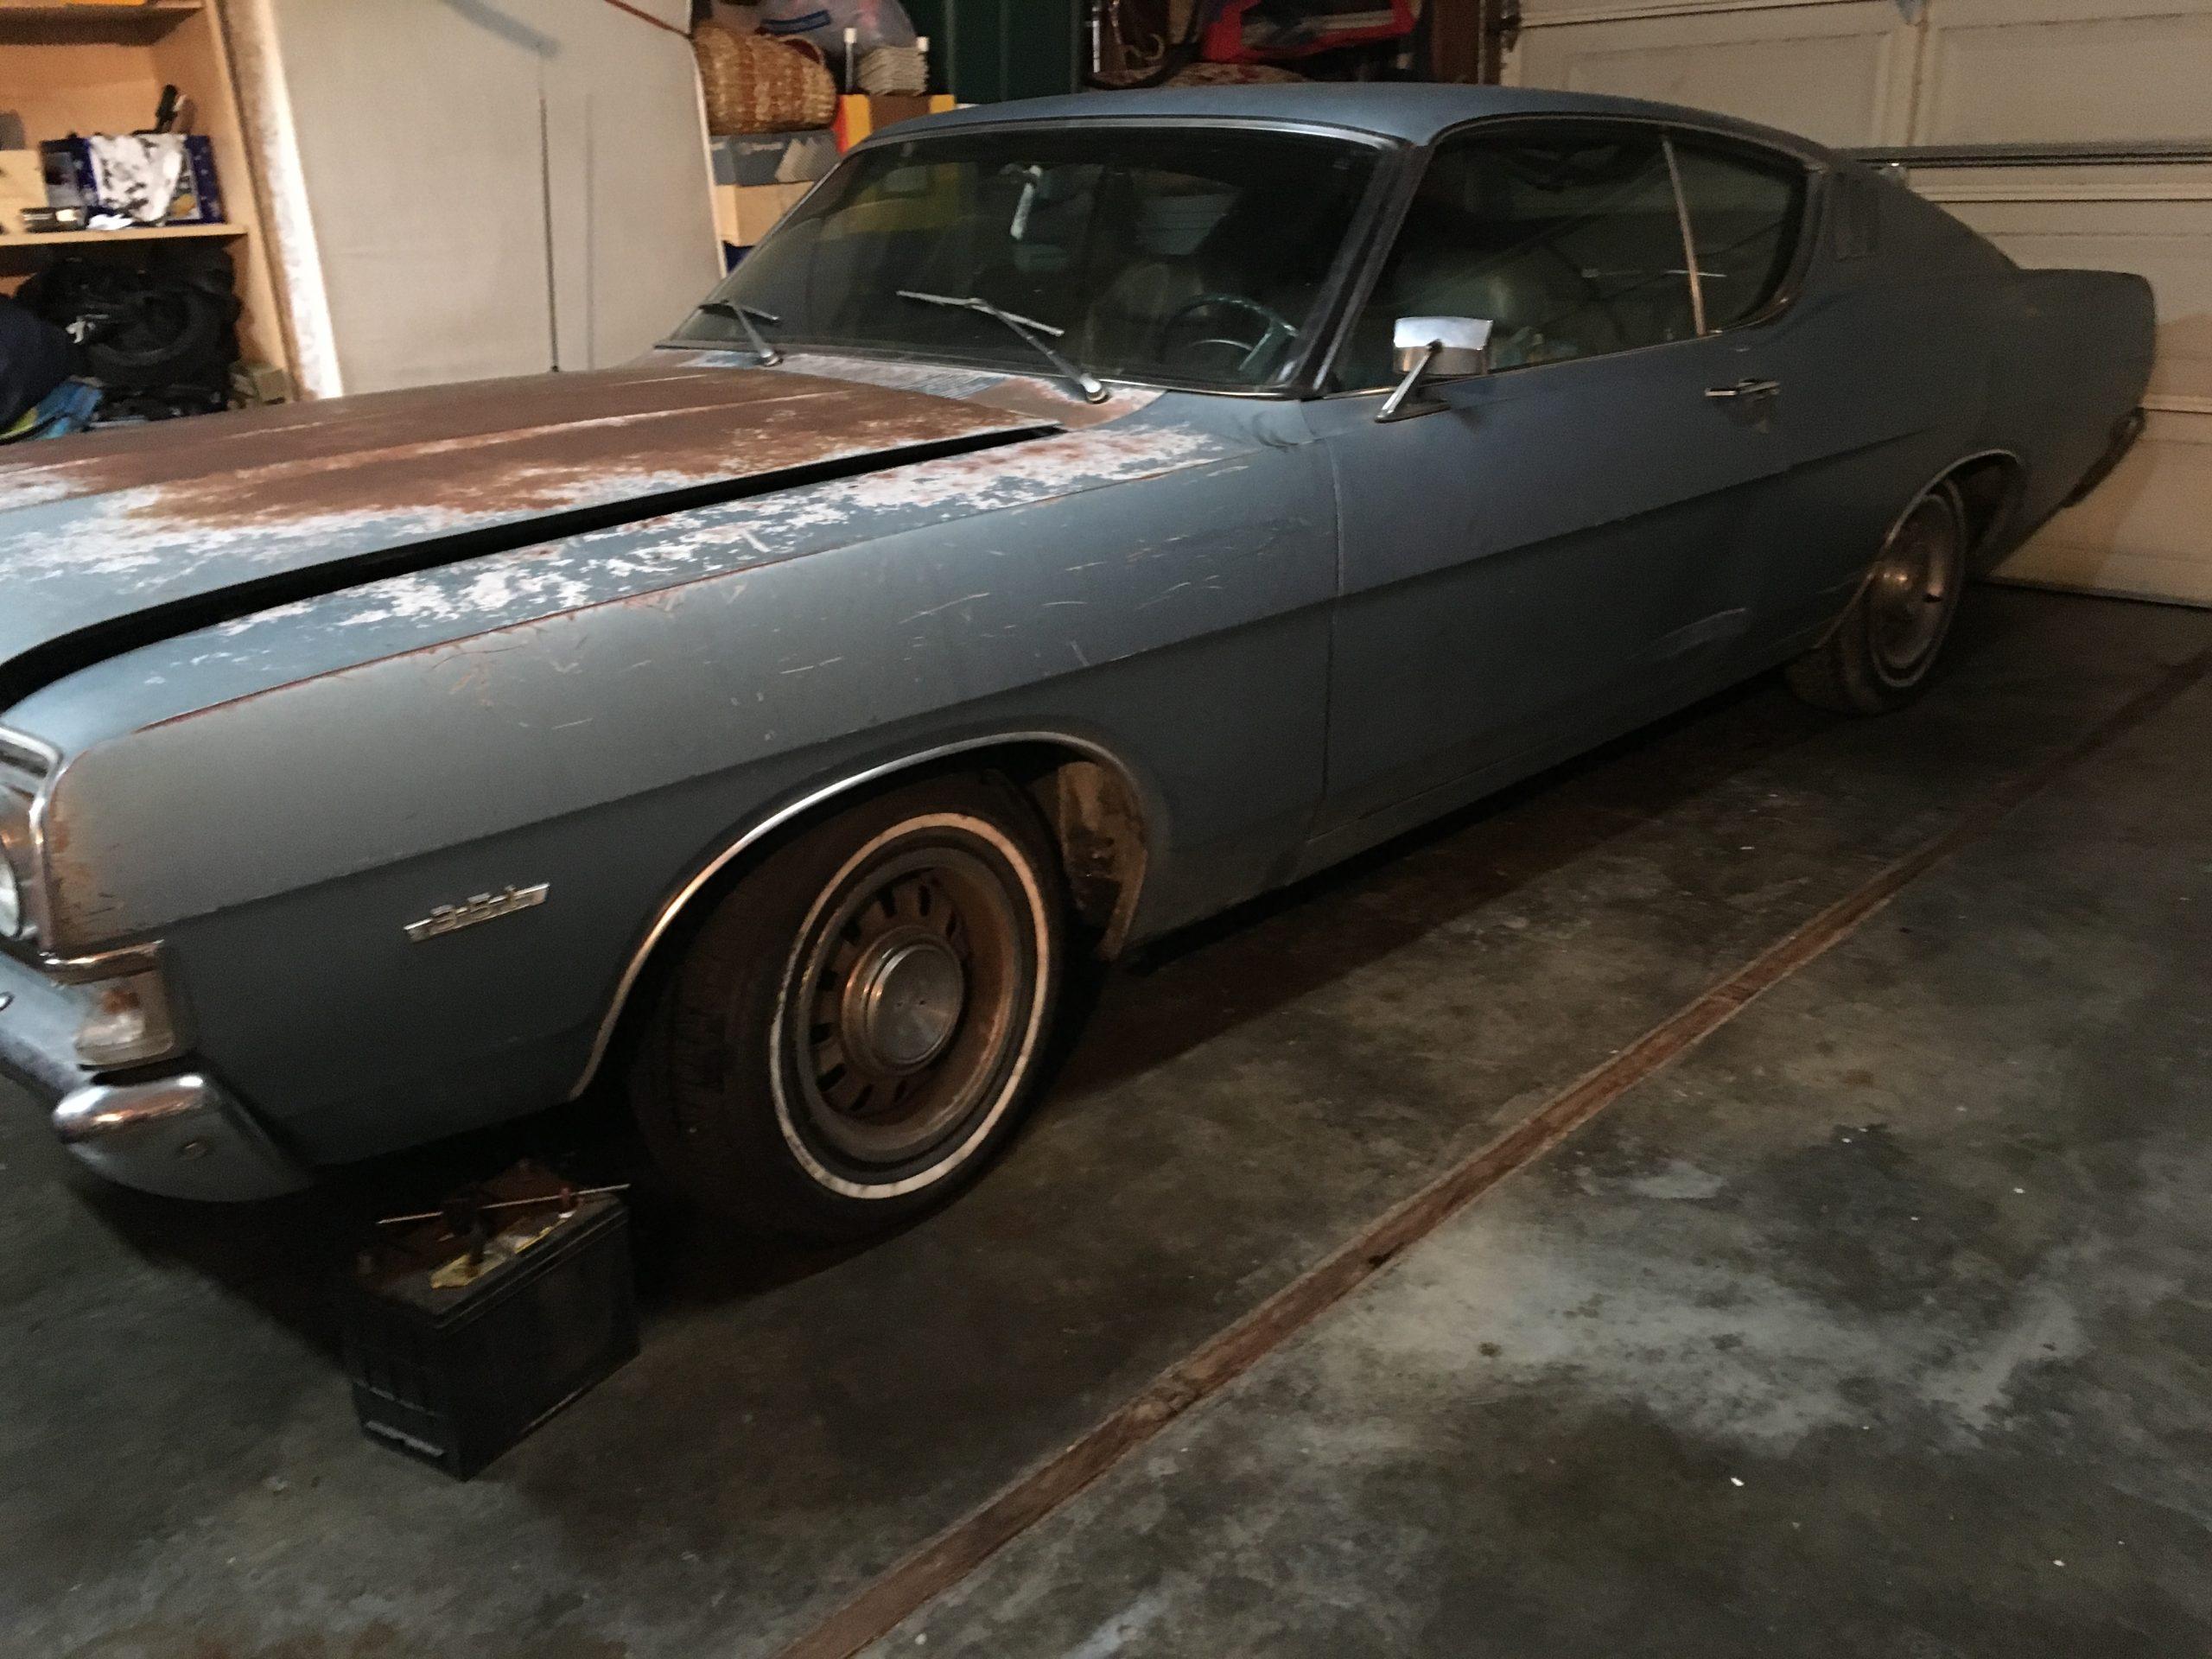 1969 Ford Torino in garage before restoration